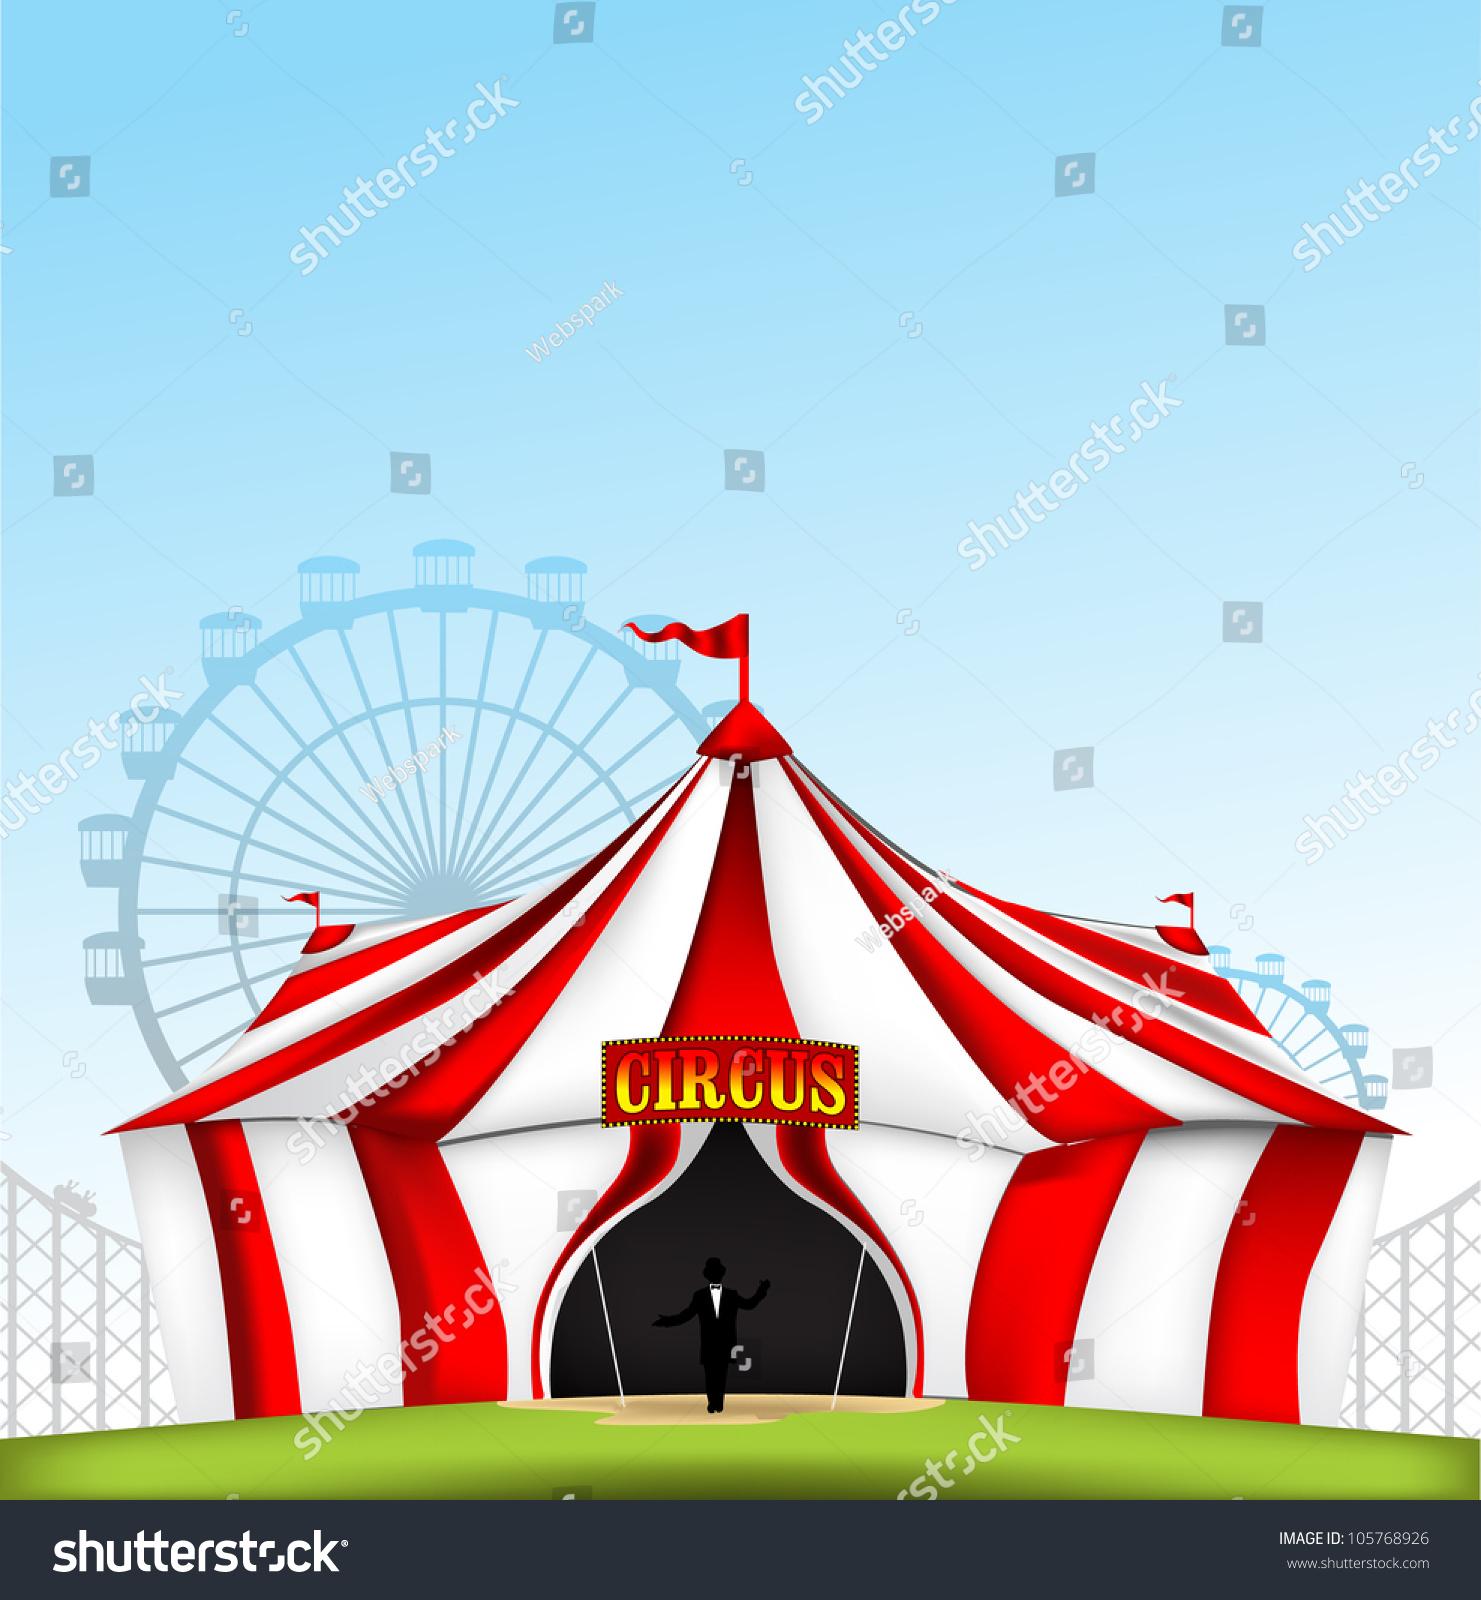 Circus Tent Stock Vector Illustration 105768926 : Shutterstock